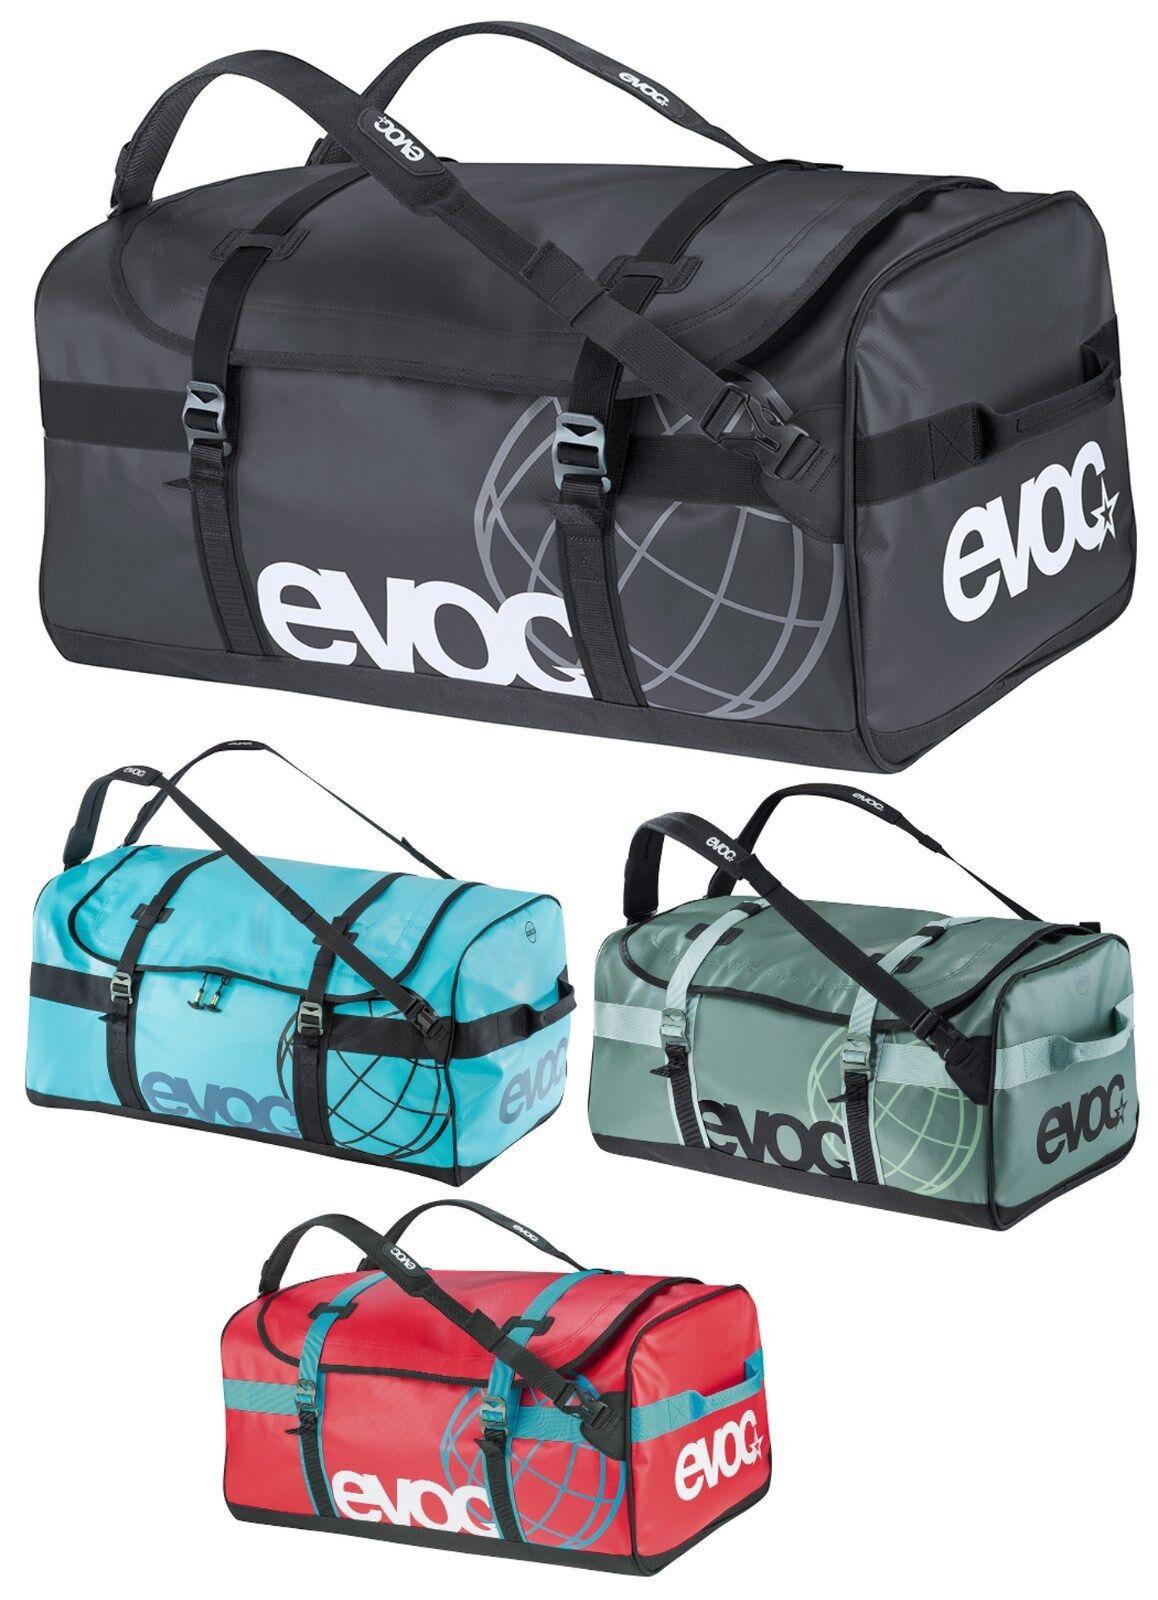 Evoc Borsone Duffle Bag Borsa da viaggio Expedition Tasche Borsa Zaino